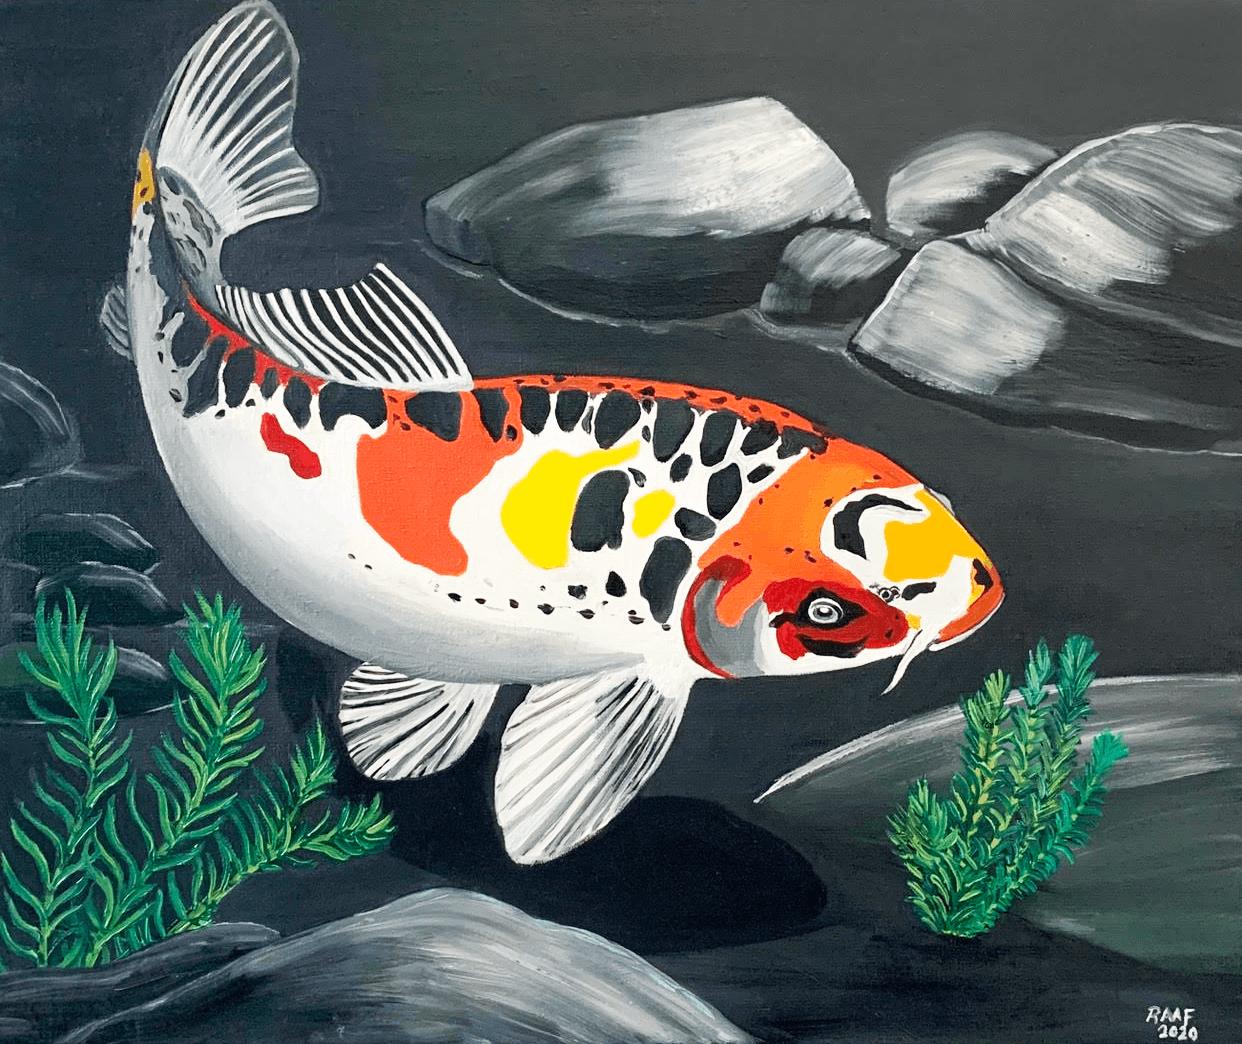 koi-carp-fish-painting-1-by-raafpaintings